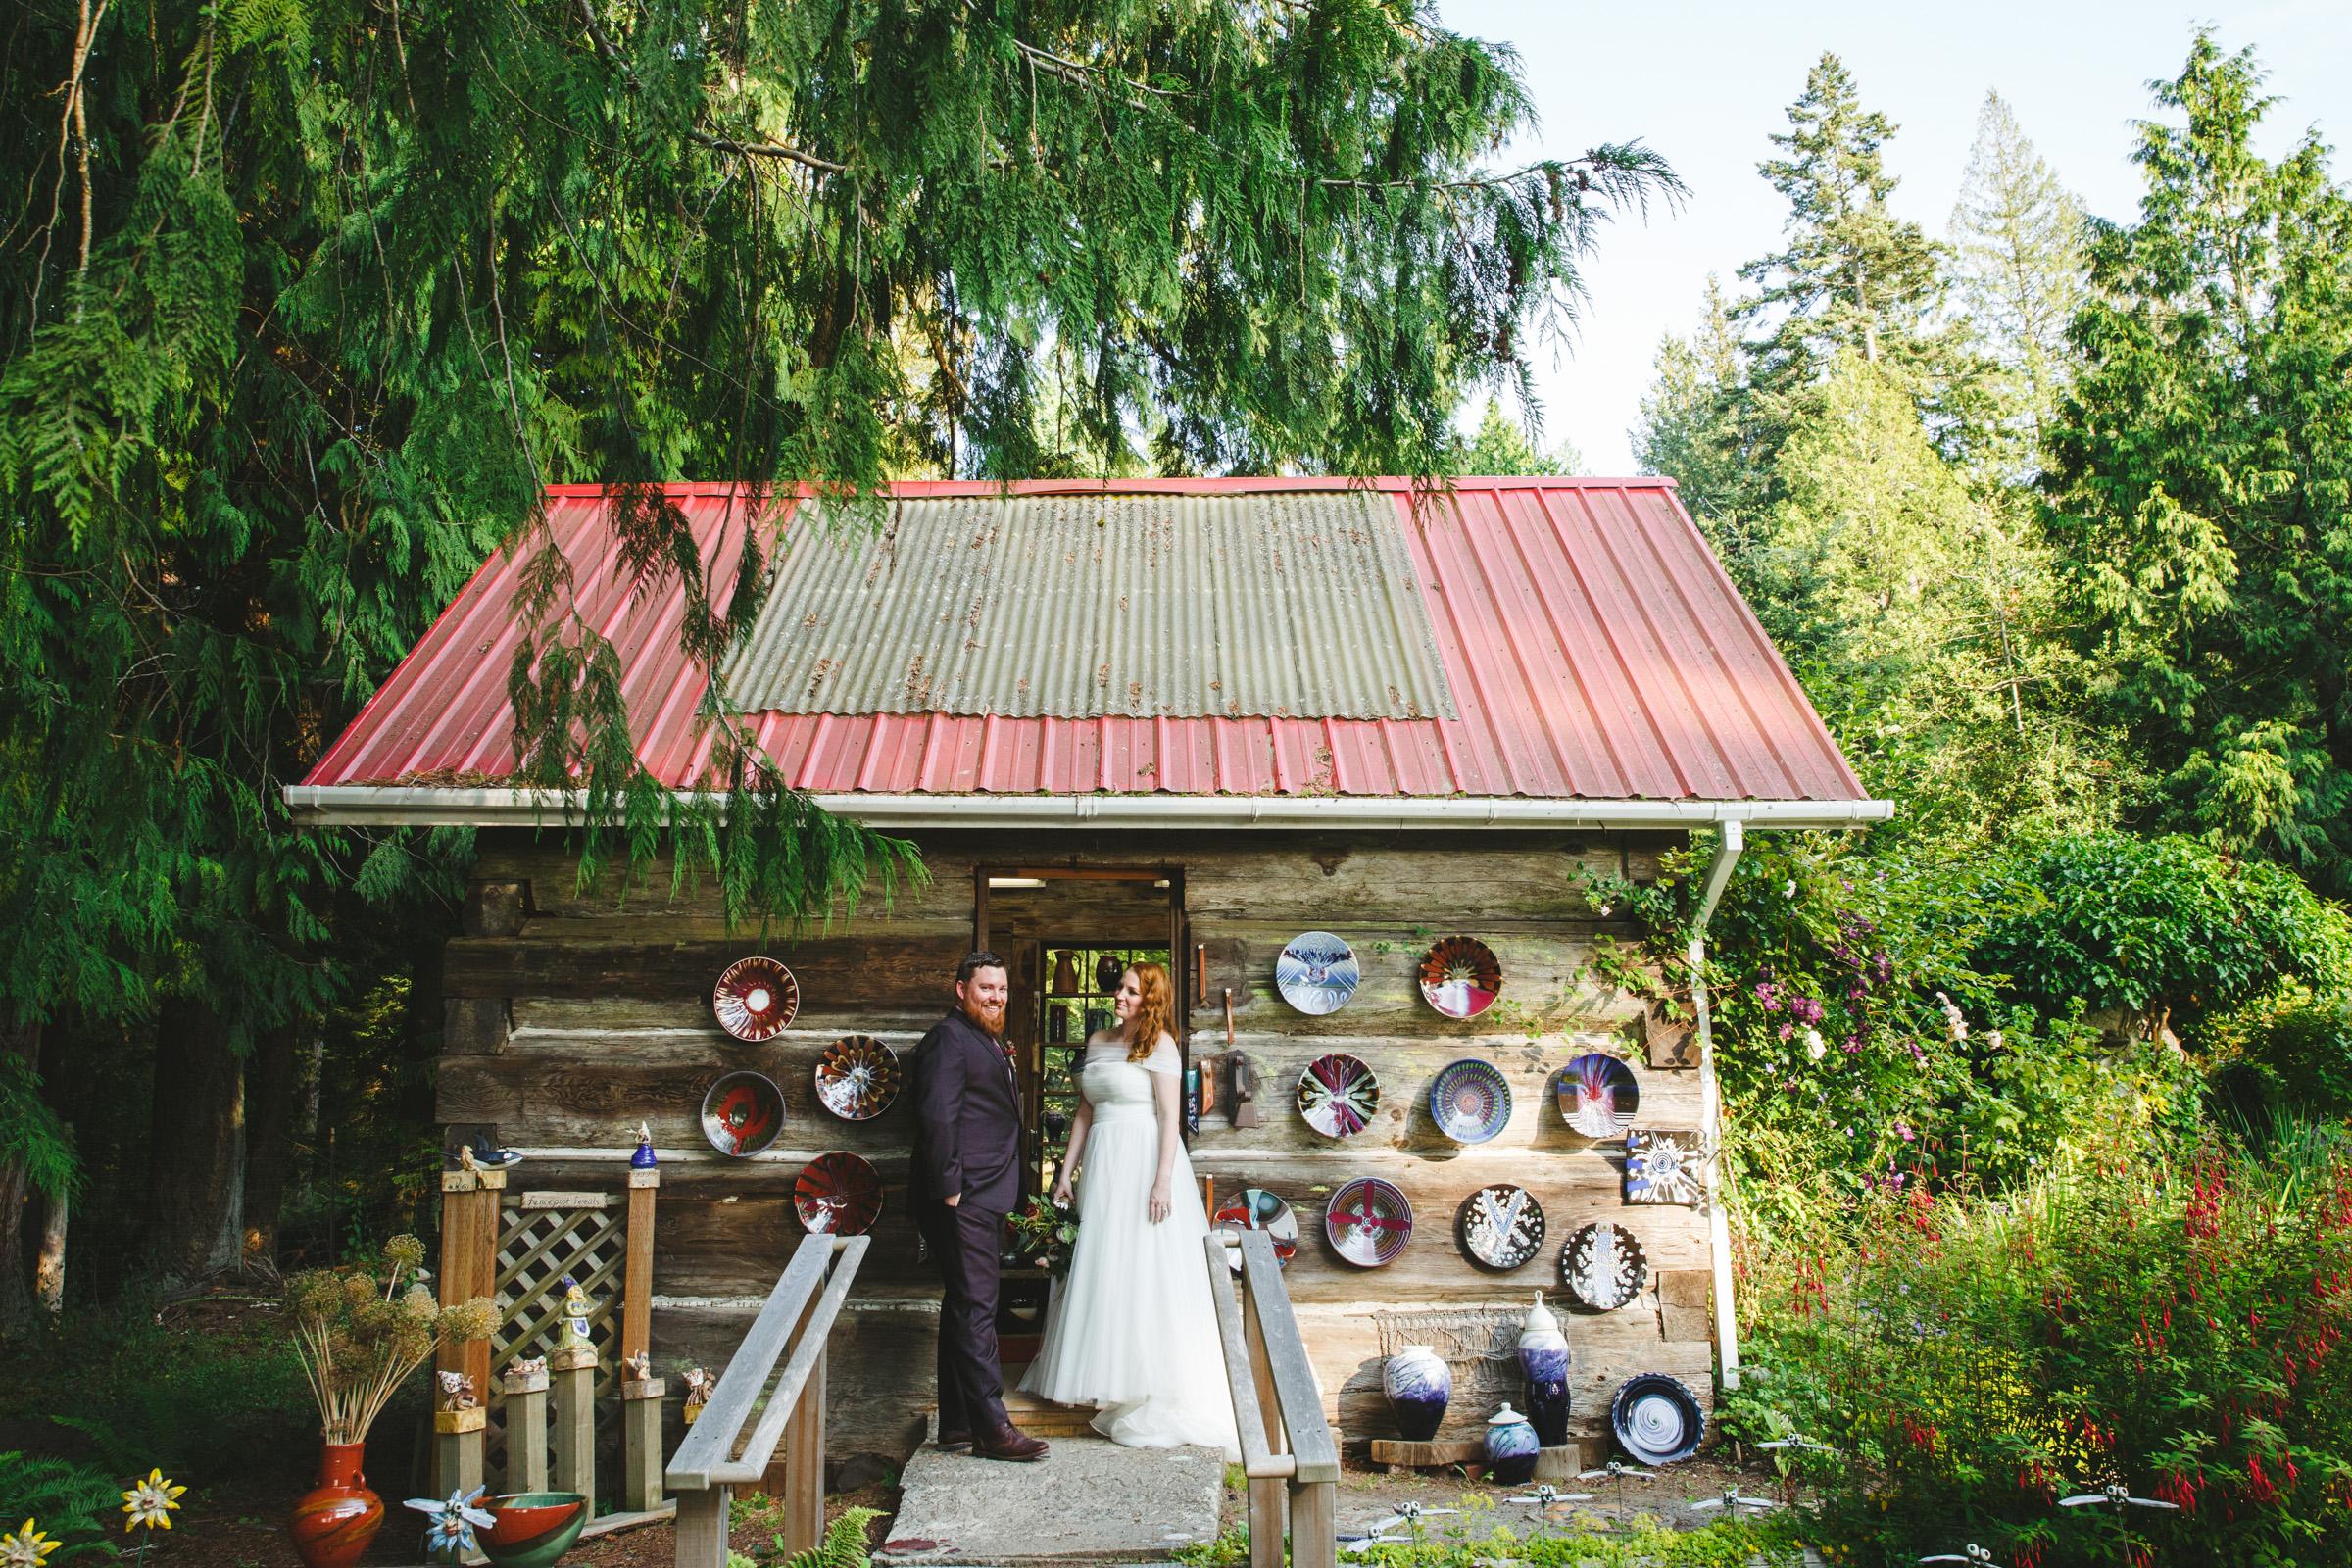 couple-outside-rustic-log-cabin-satya-curcio-photography